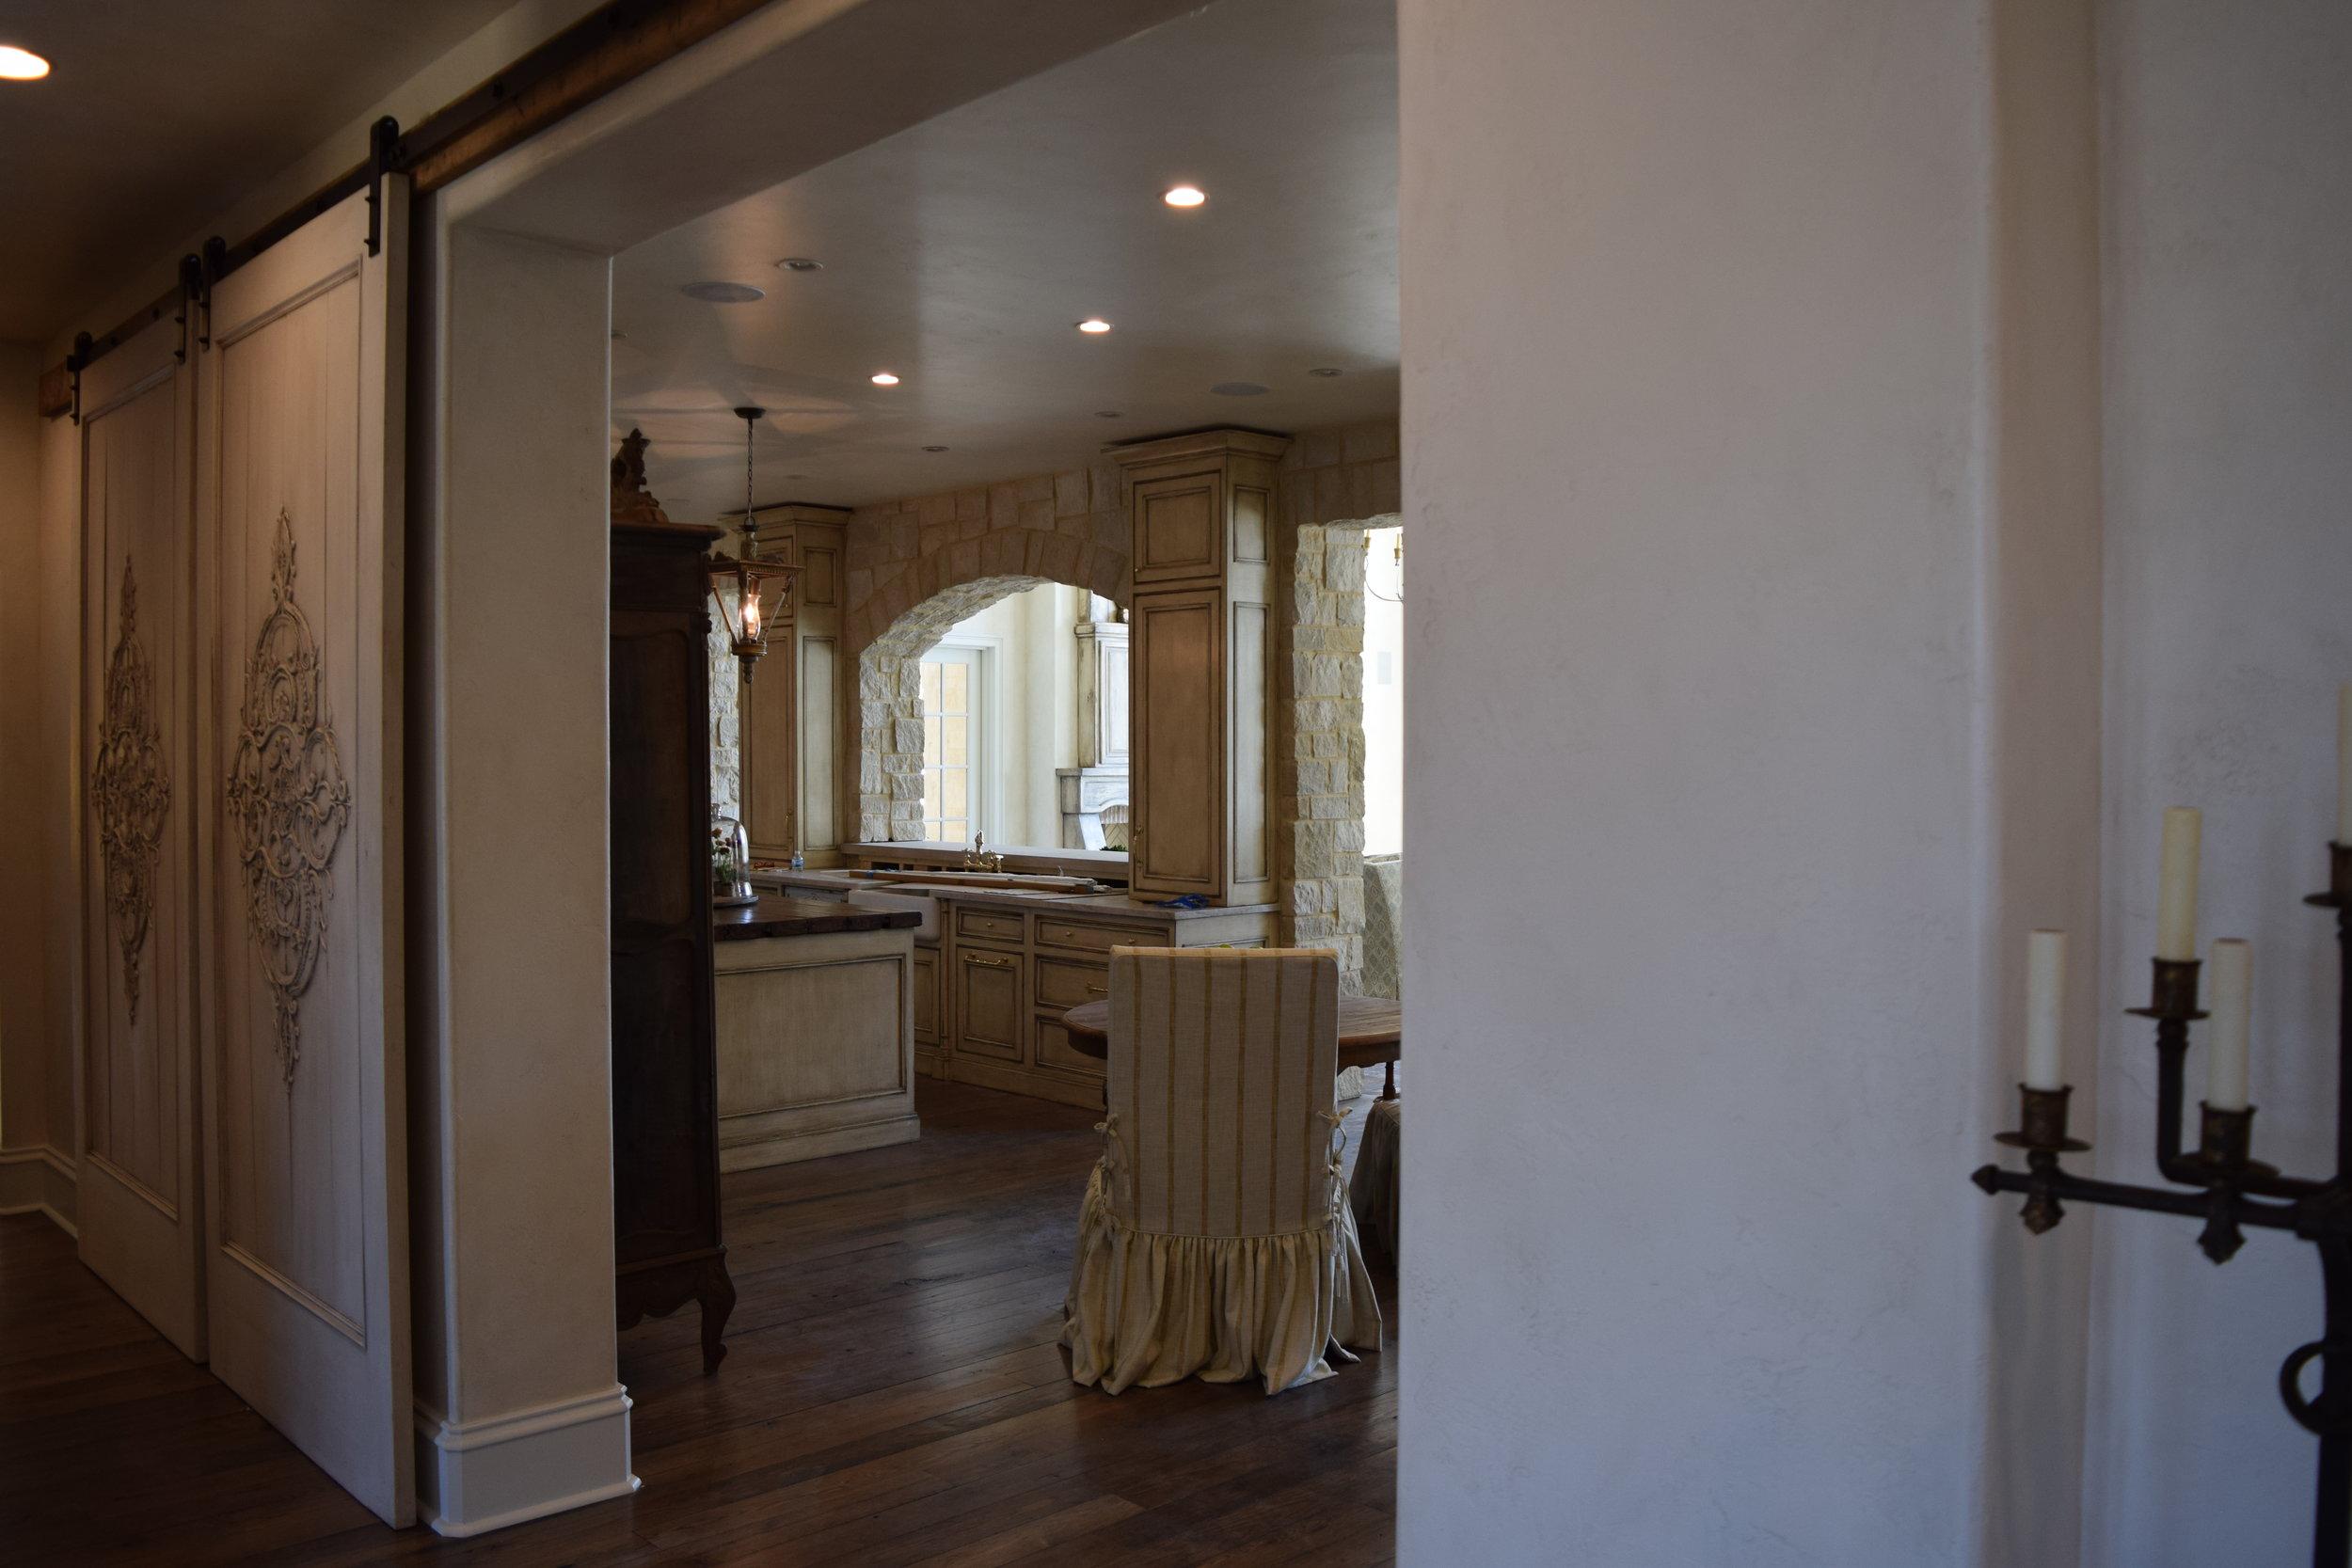 Hallway looking into Kitchen